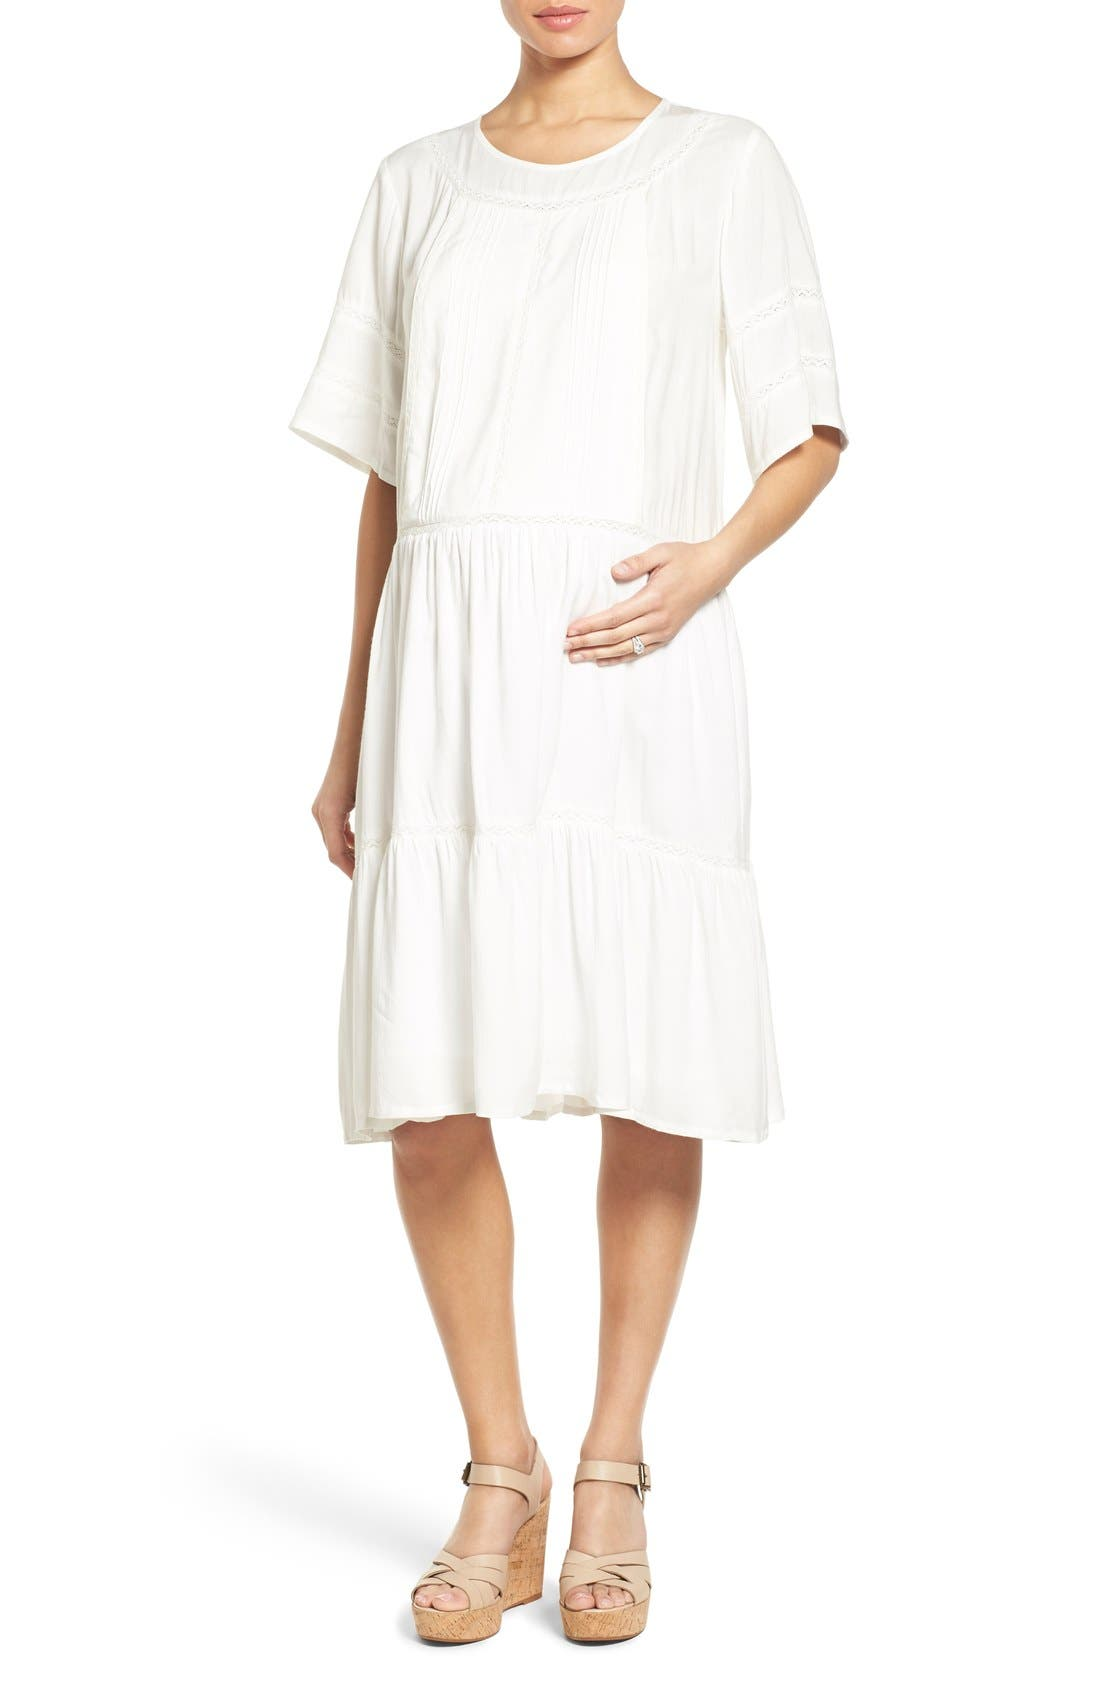 'Wild at Heart' Maternity/Nursing Midi Dress,                         Main,                         color, 900